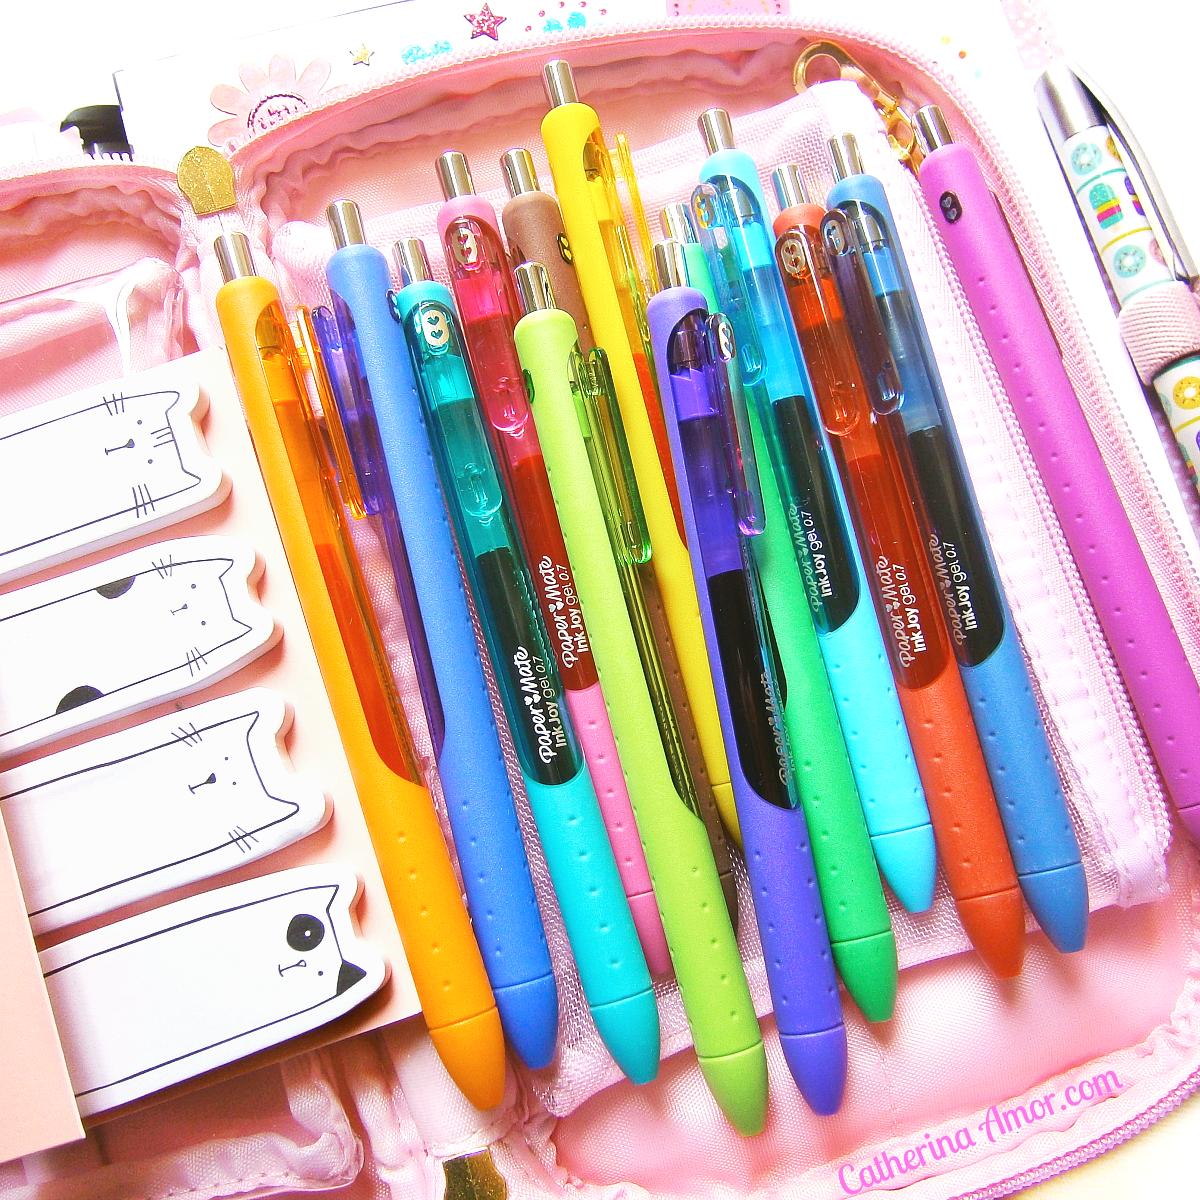 Inkjoy Pens